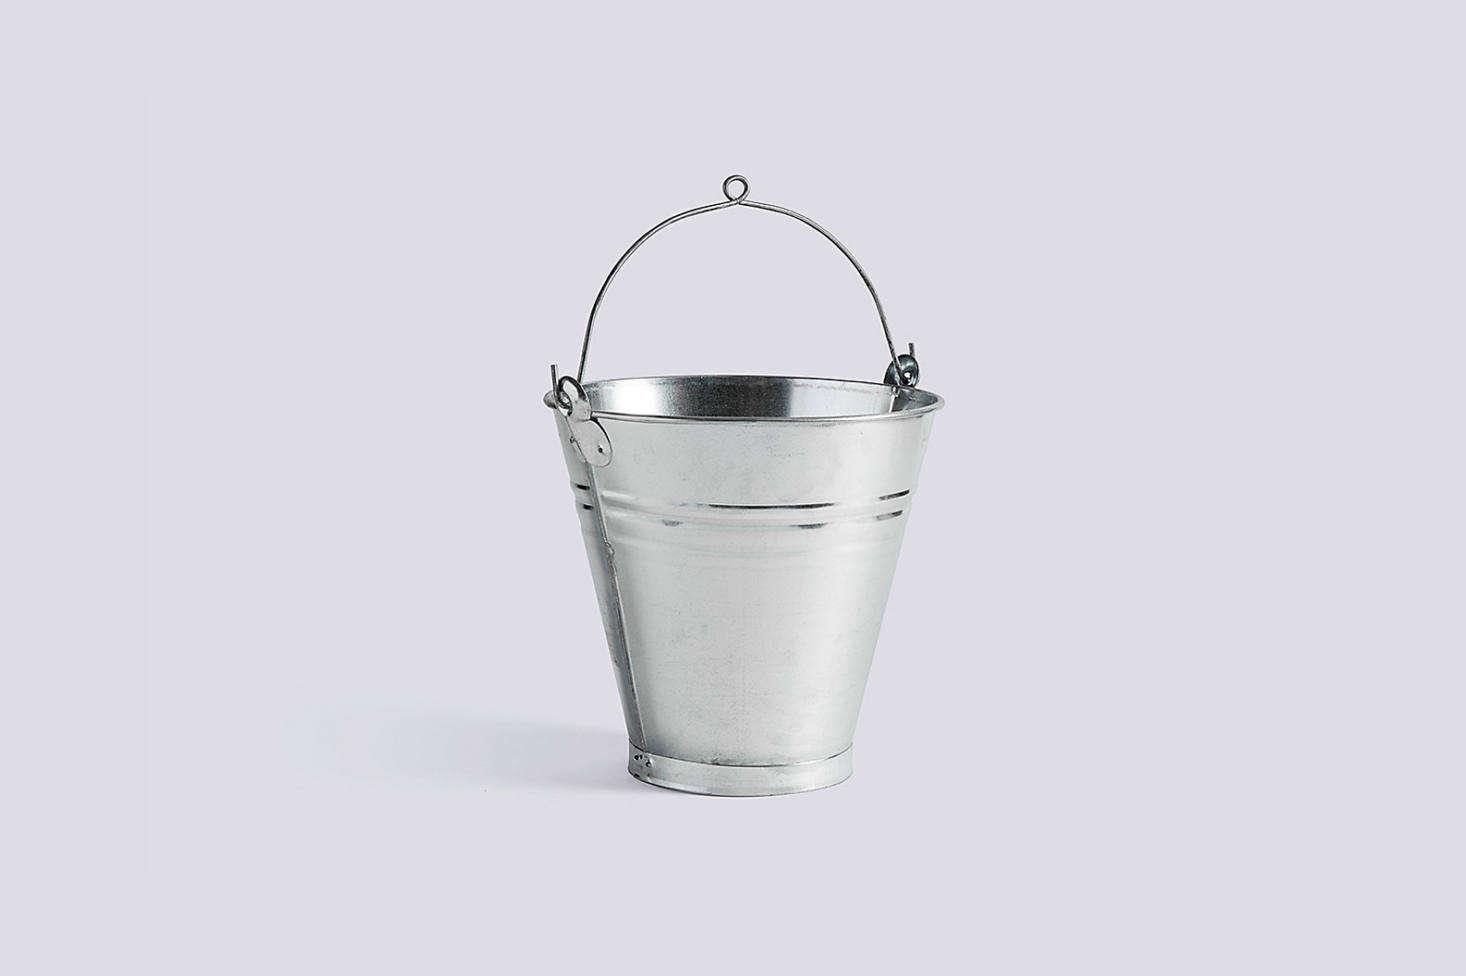 The galvanized iron Turkish Handmade Bucket is $ at Hay.